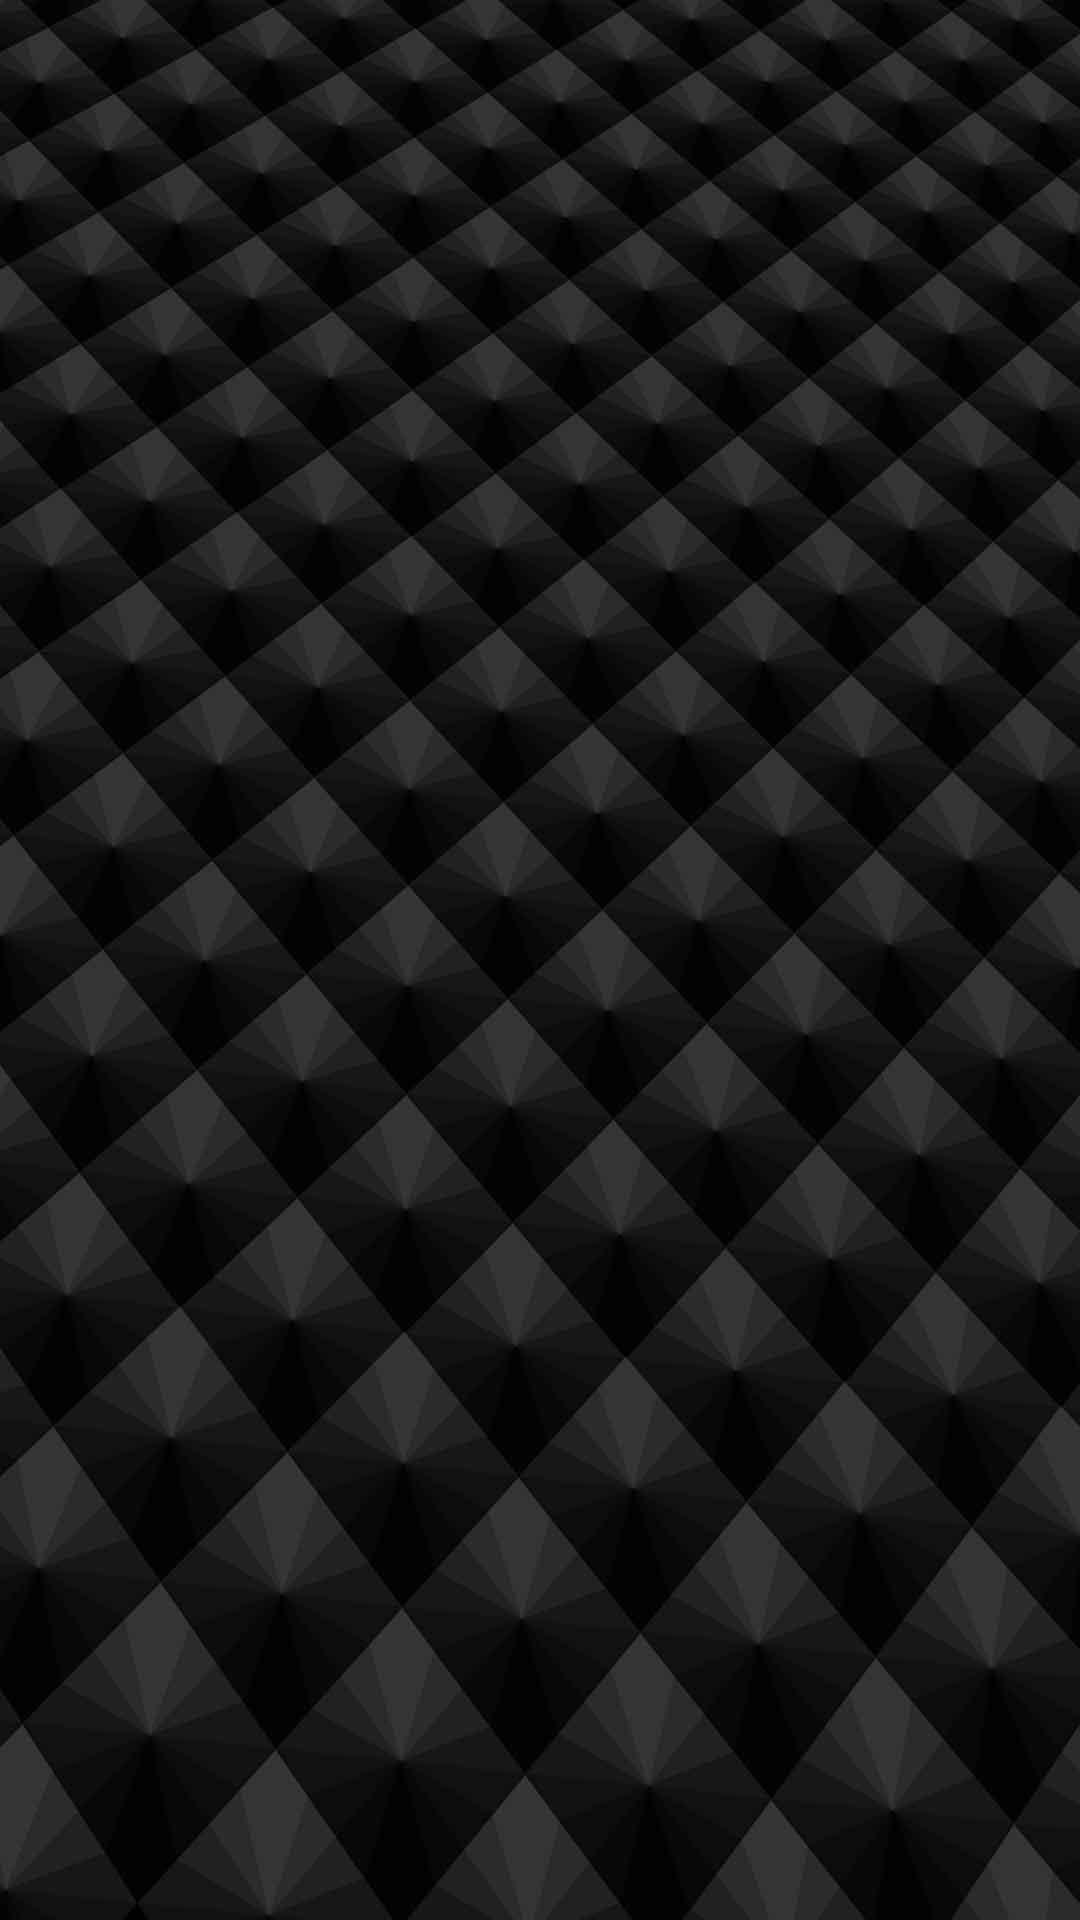 black wallpaper images